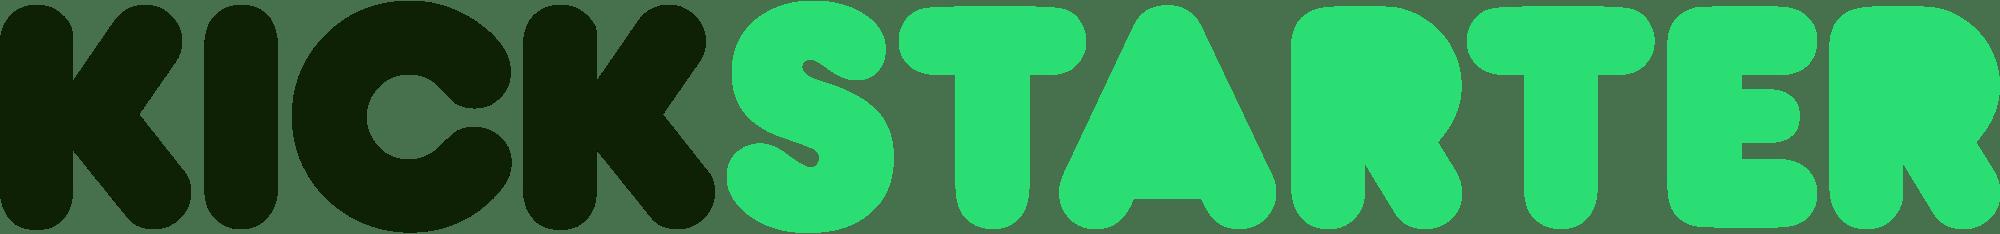 Kickstarter company logo